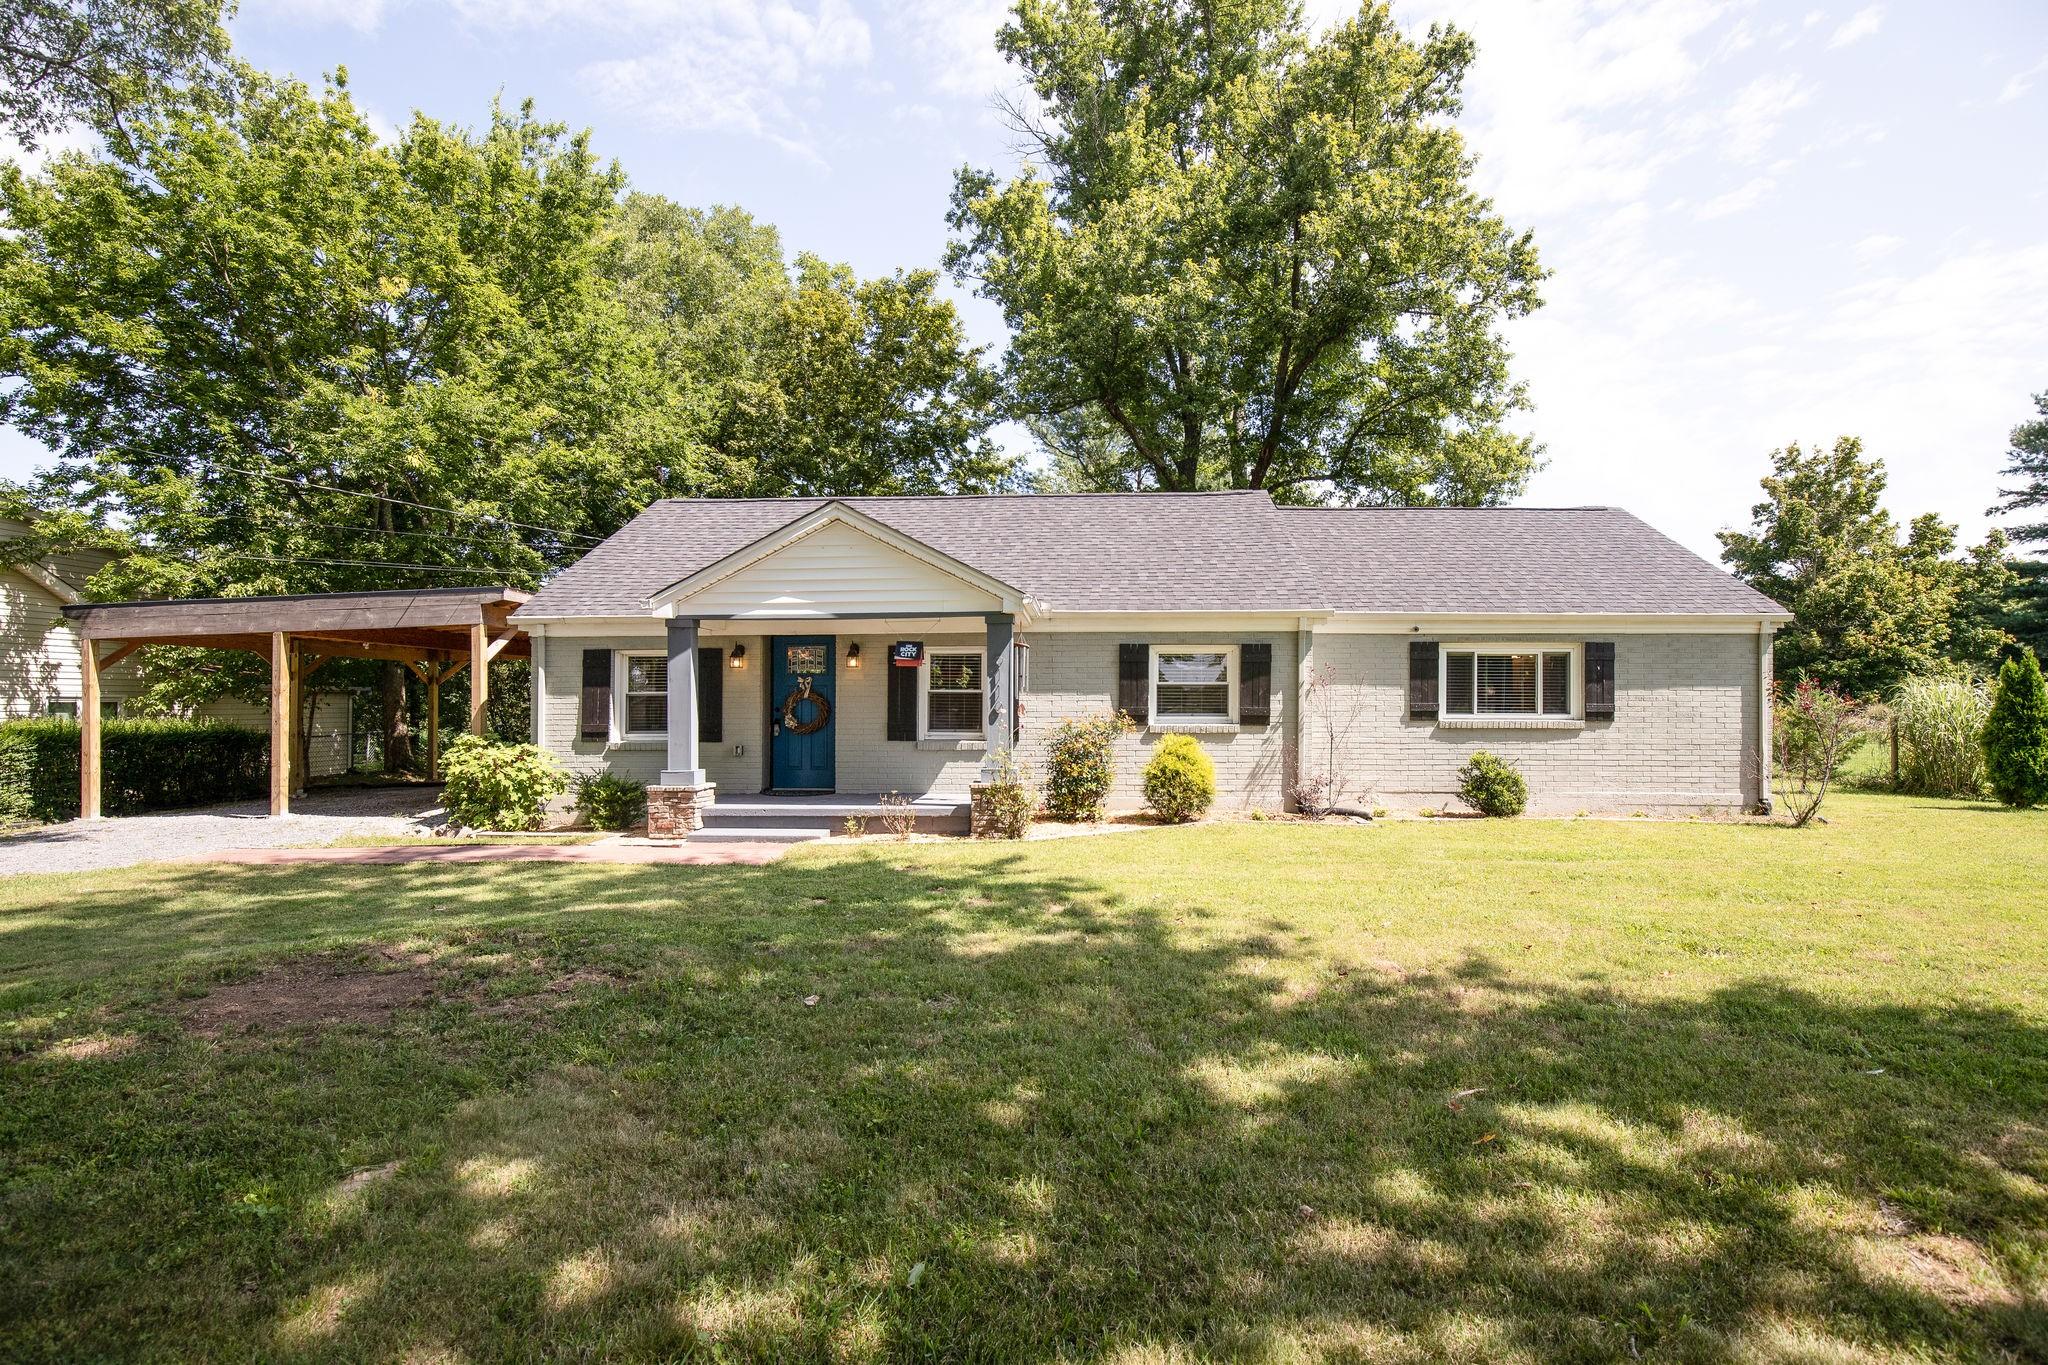 5110 Rawlings Rd, Joelton, TN 37080 - Joelton, TN real estate listing